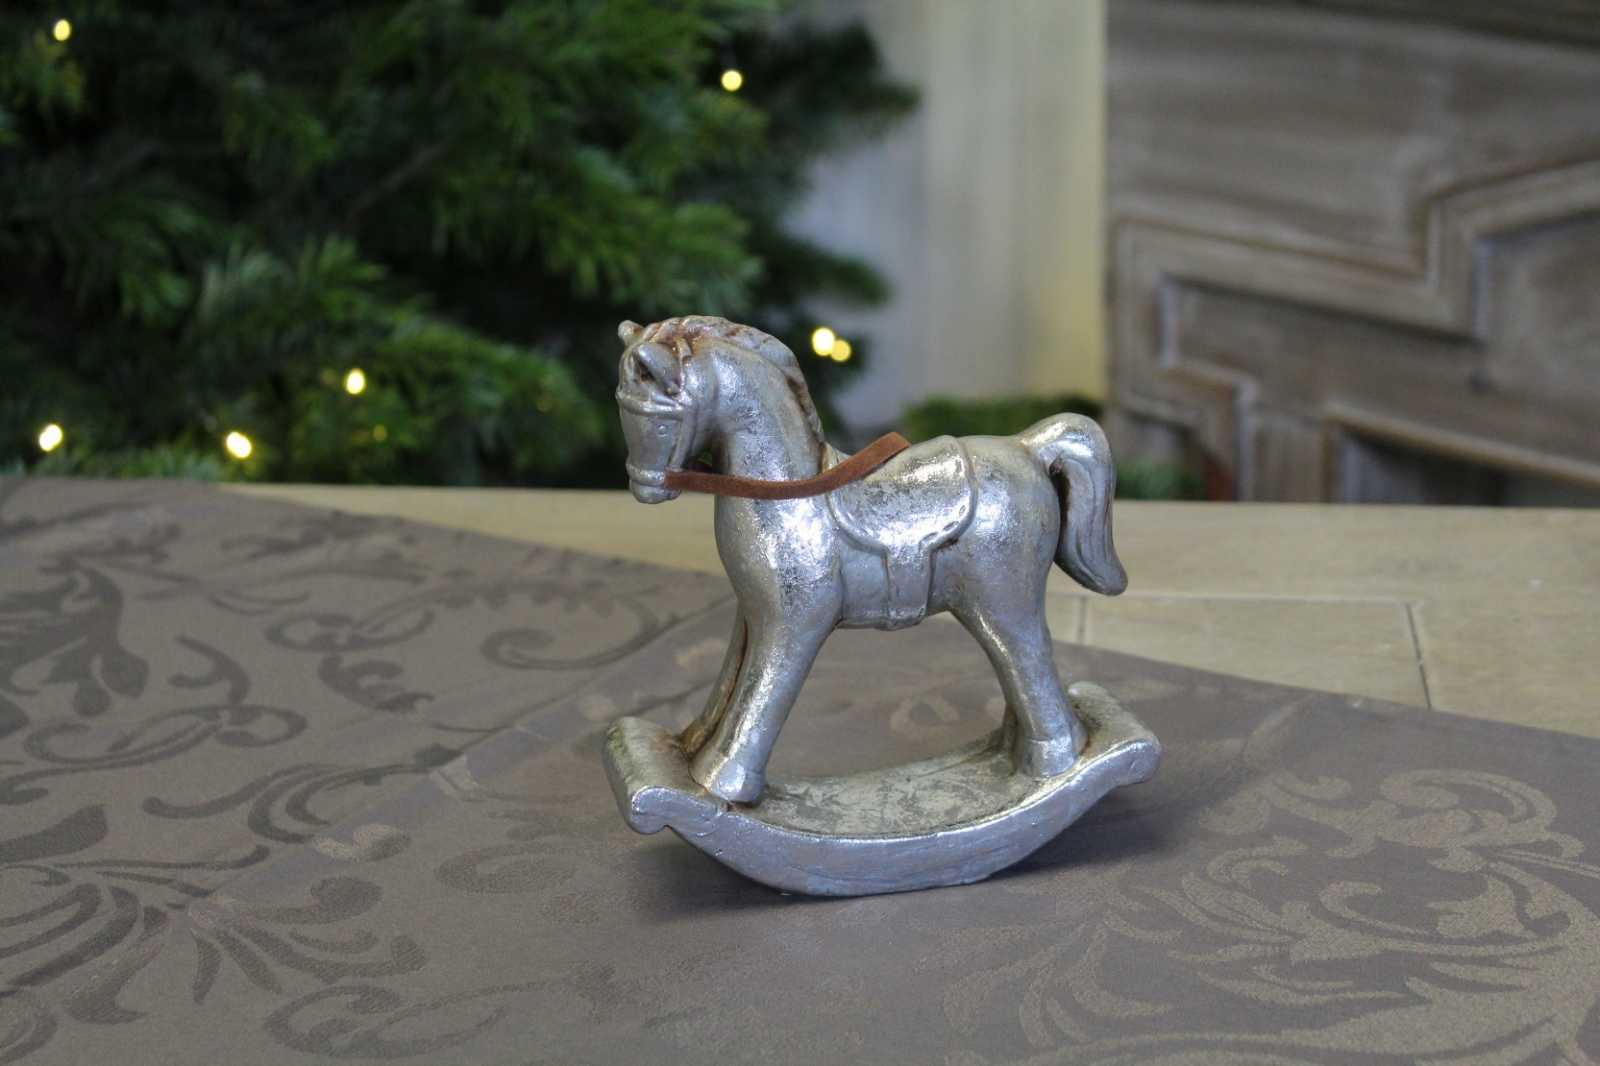 Онлайн каталог PROMENU: Cтатуэтка лошадка-качалка Goldbach, 14х5х15 см, серебристый, в ассортименте Goldbach 64 3767